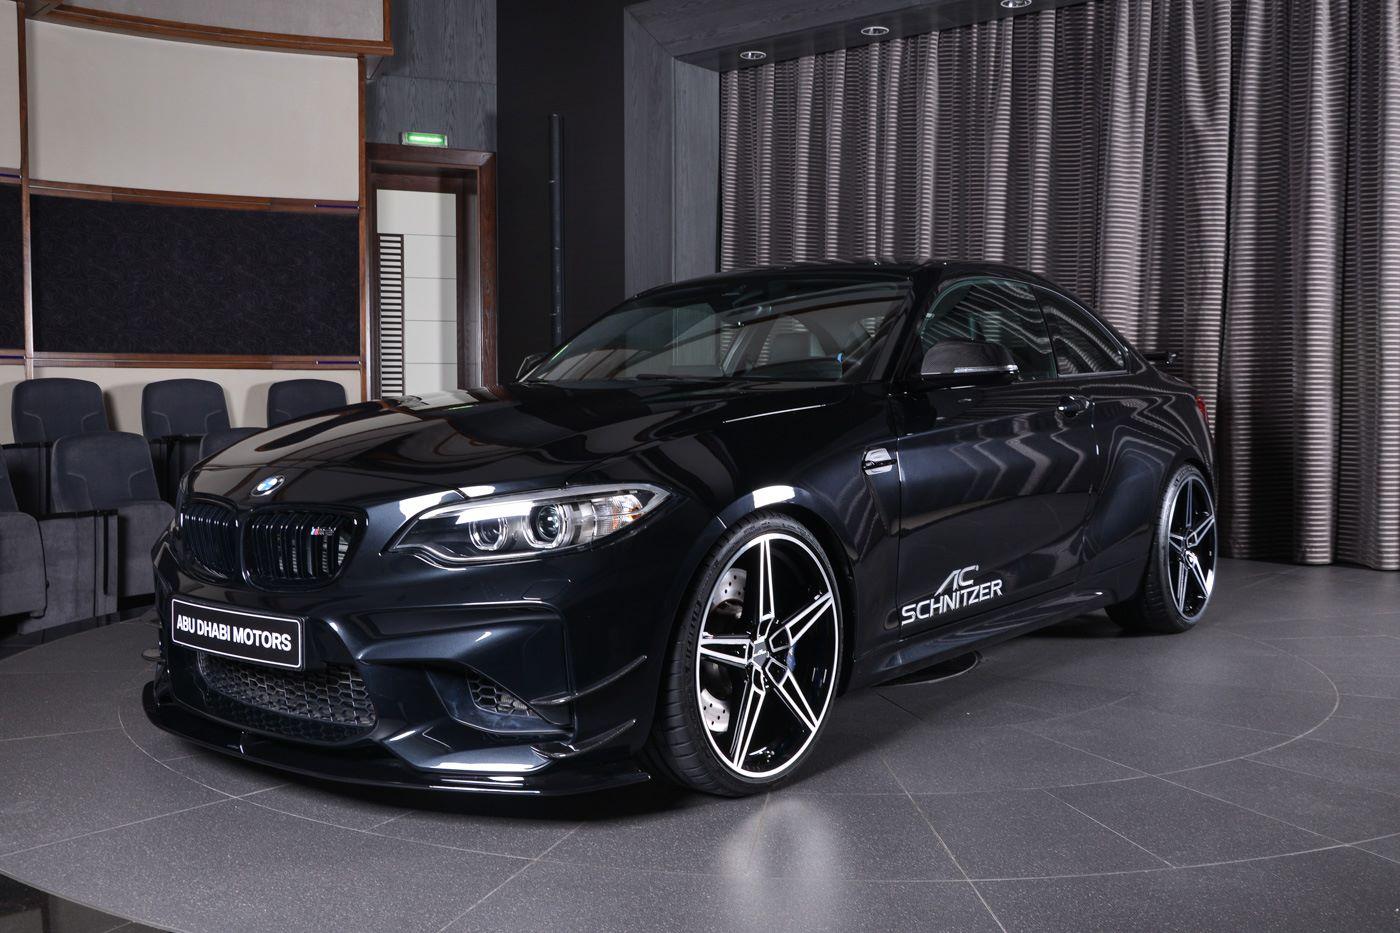 Sapphire Black BMW M Gets AC Schnitzer Kit In Abu Dhabi Autoevolution - Bmw ac schnitzer